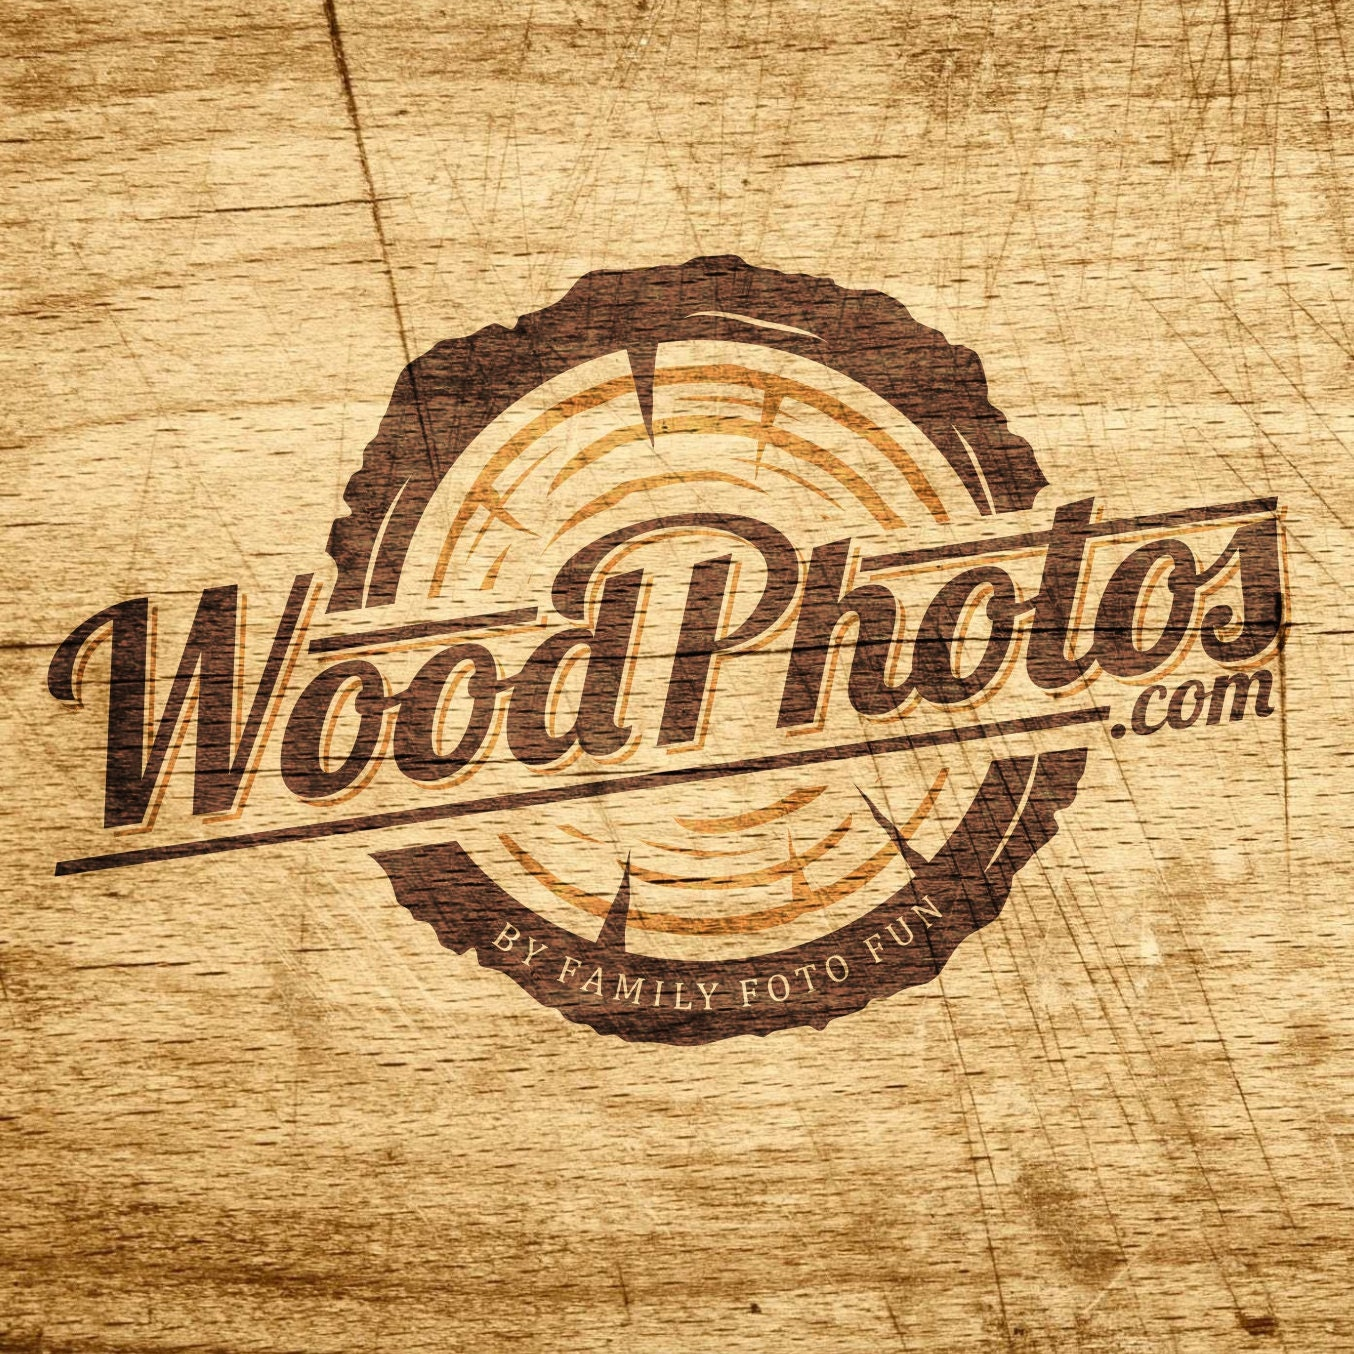 Custom Handmade Photos on Wood by FamilyFotoFun on Etsy